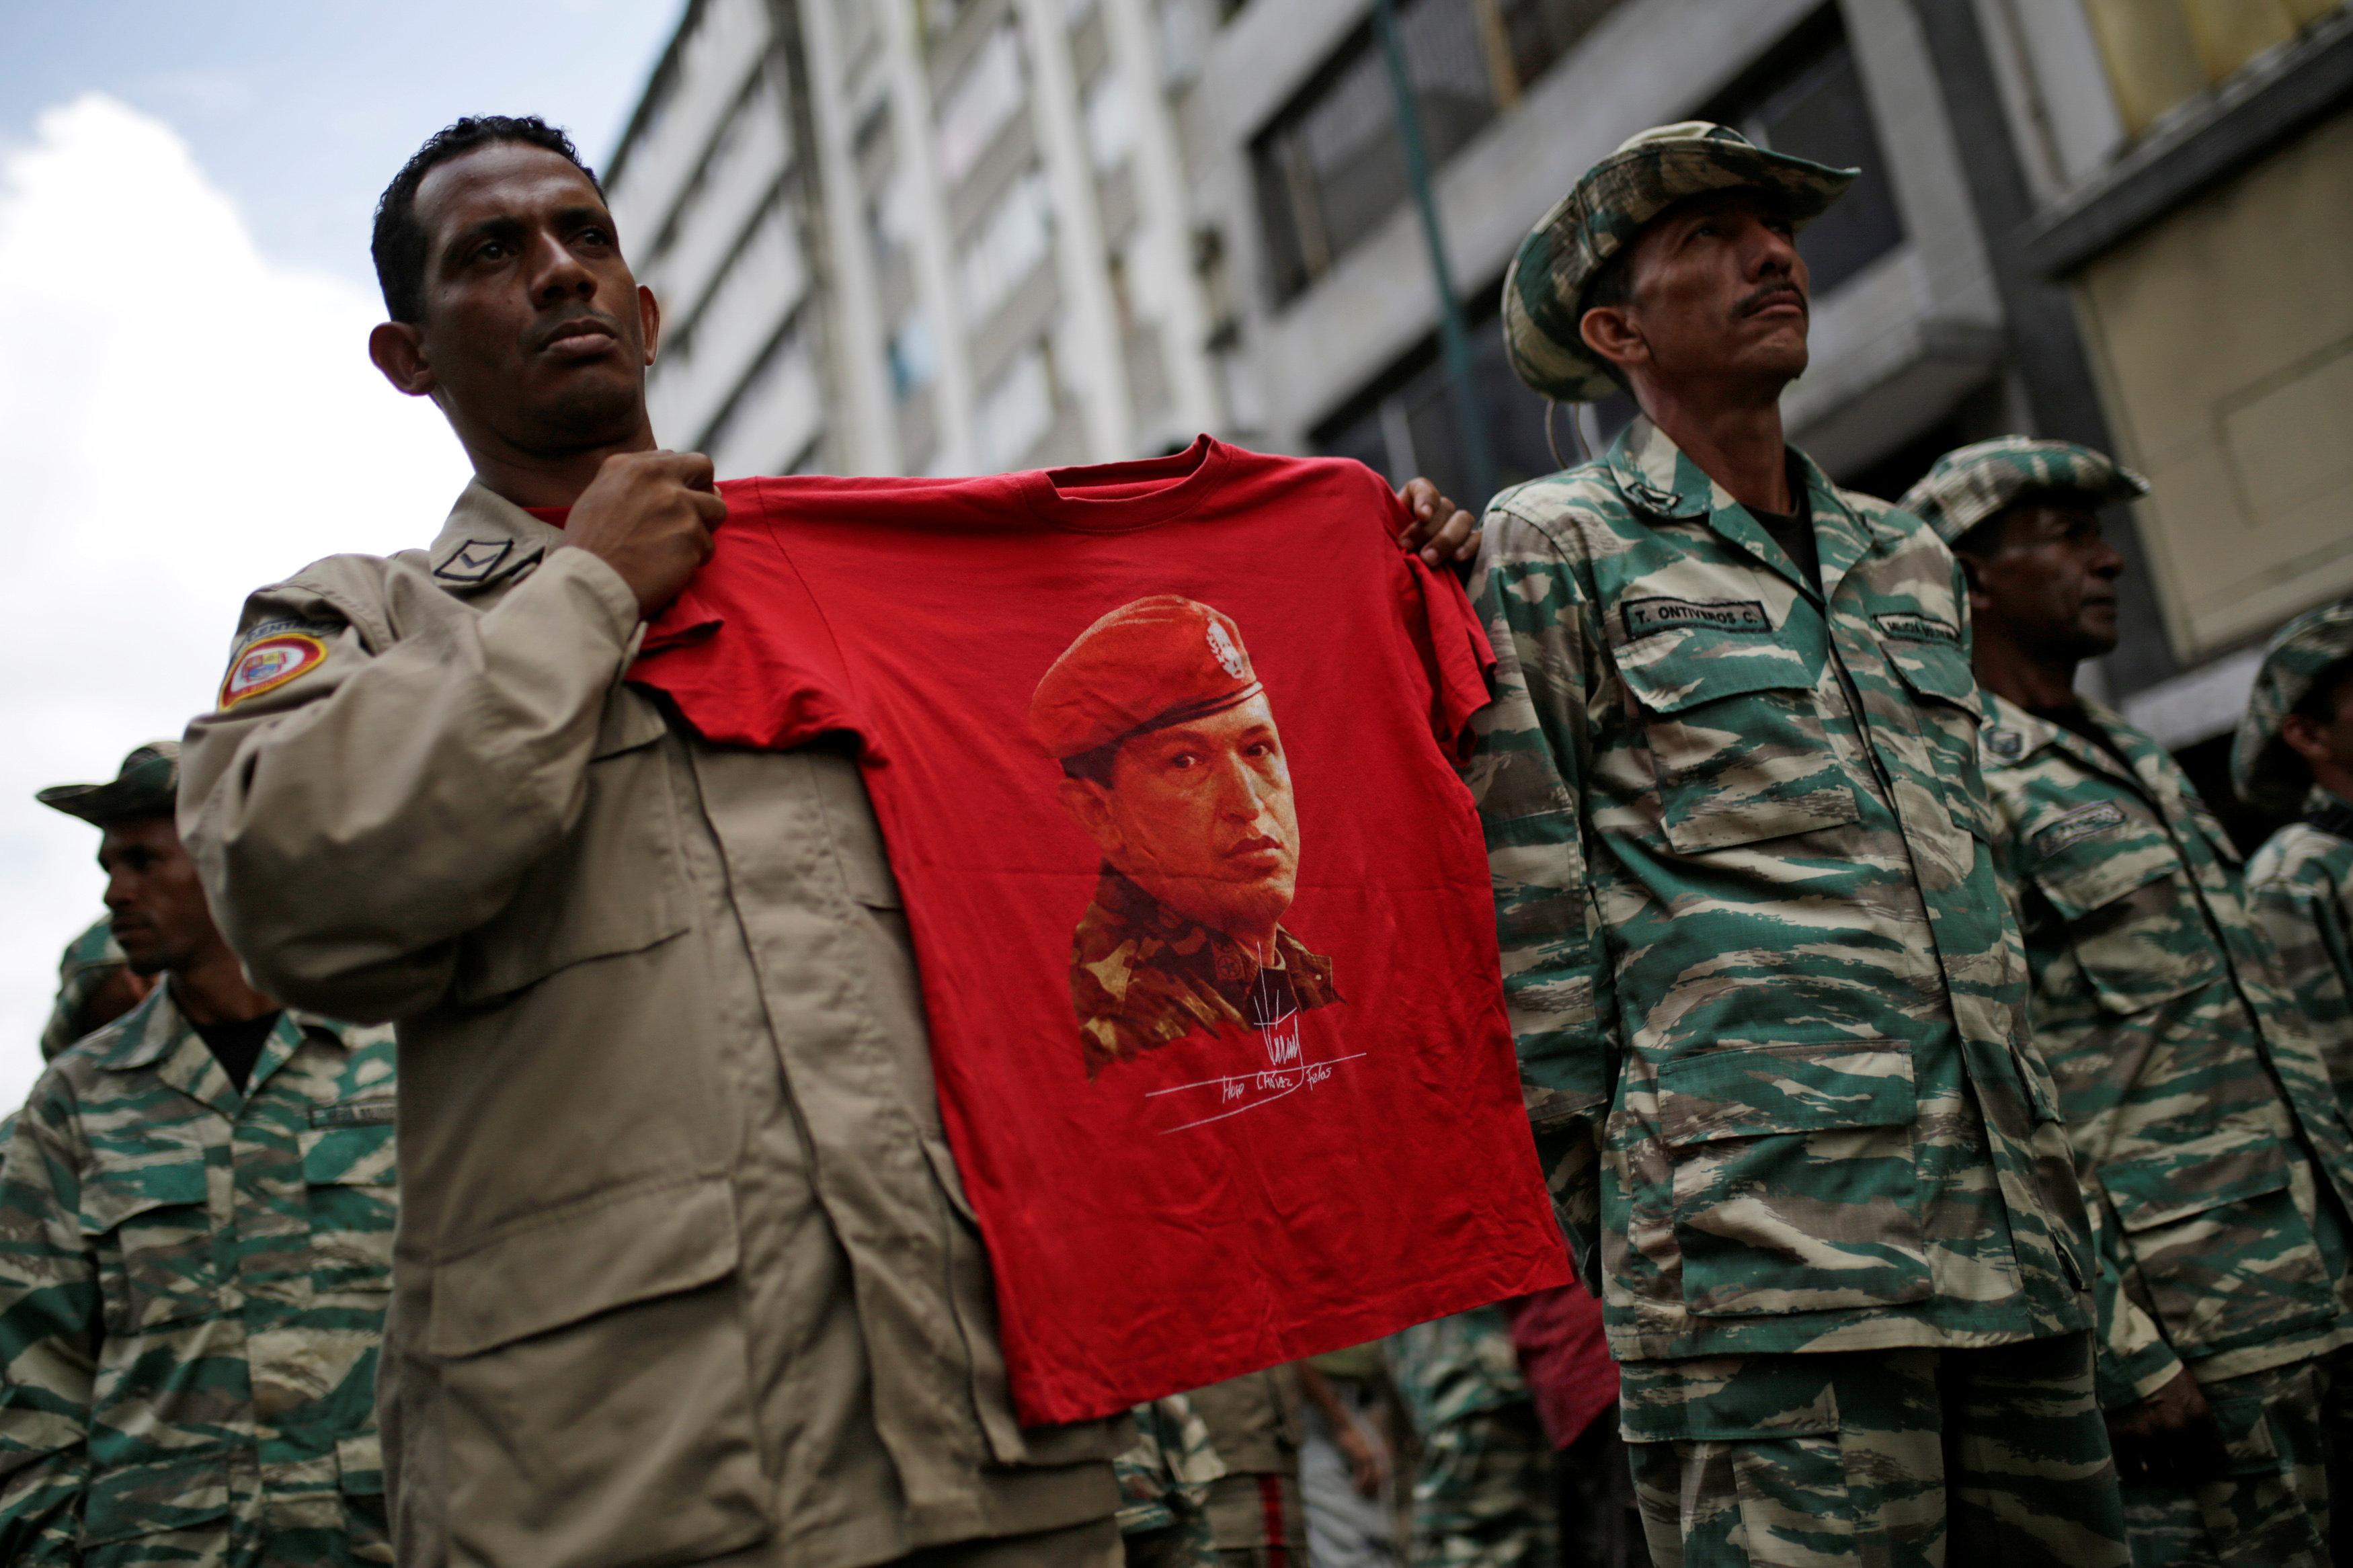 A militia member holds a t-shirt with an image of Venezuela's late President Hugo Chavez during a ceremony with Venezuela's President Nicolas Maduro at Miraflores Palace in Caracas, Venezuela April 17, 2017. REUTERS/Marco Bello